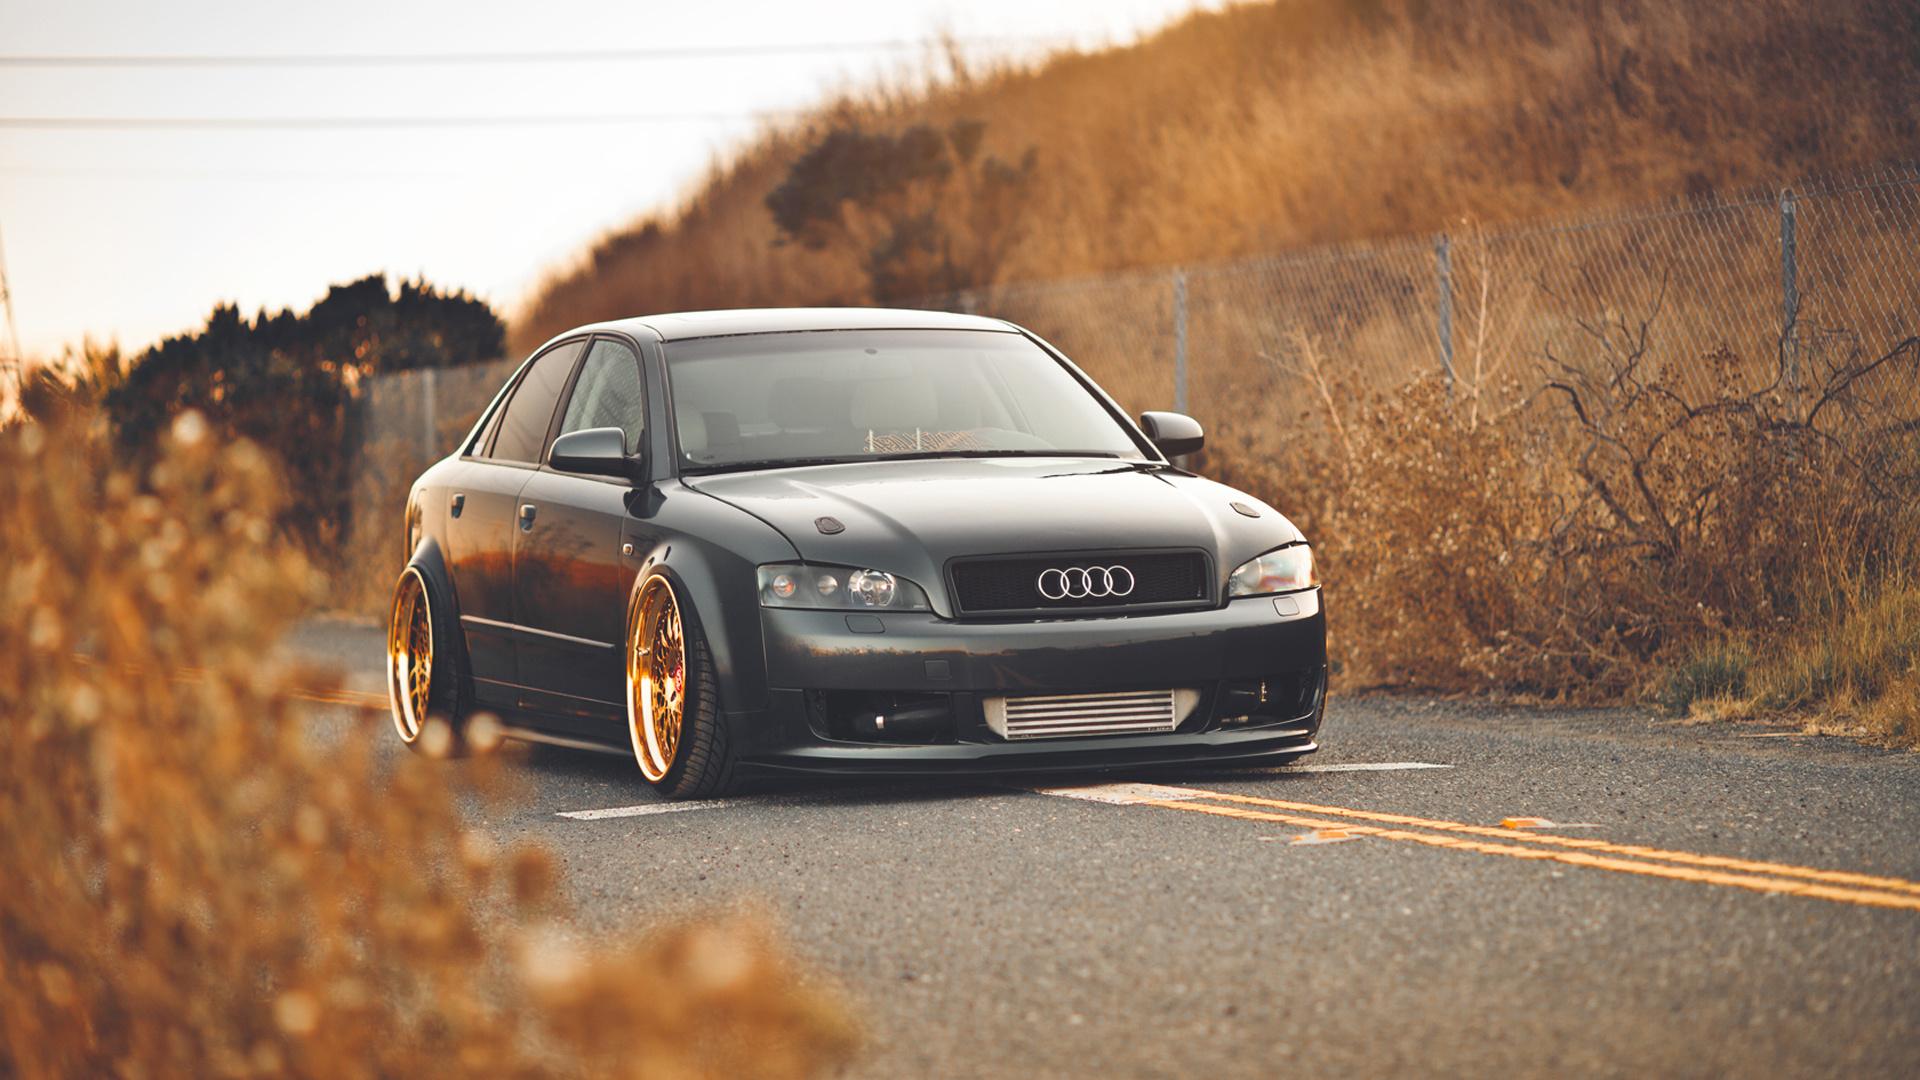 Download Wallpaper 1920x1080 Audi A4 Audi Autumn Gold Full Hd 1080p Hd Background